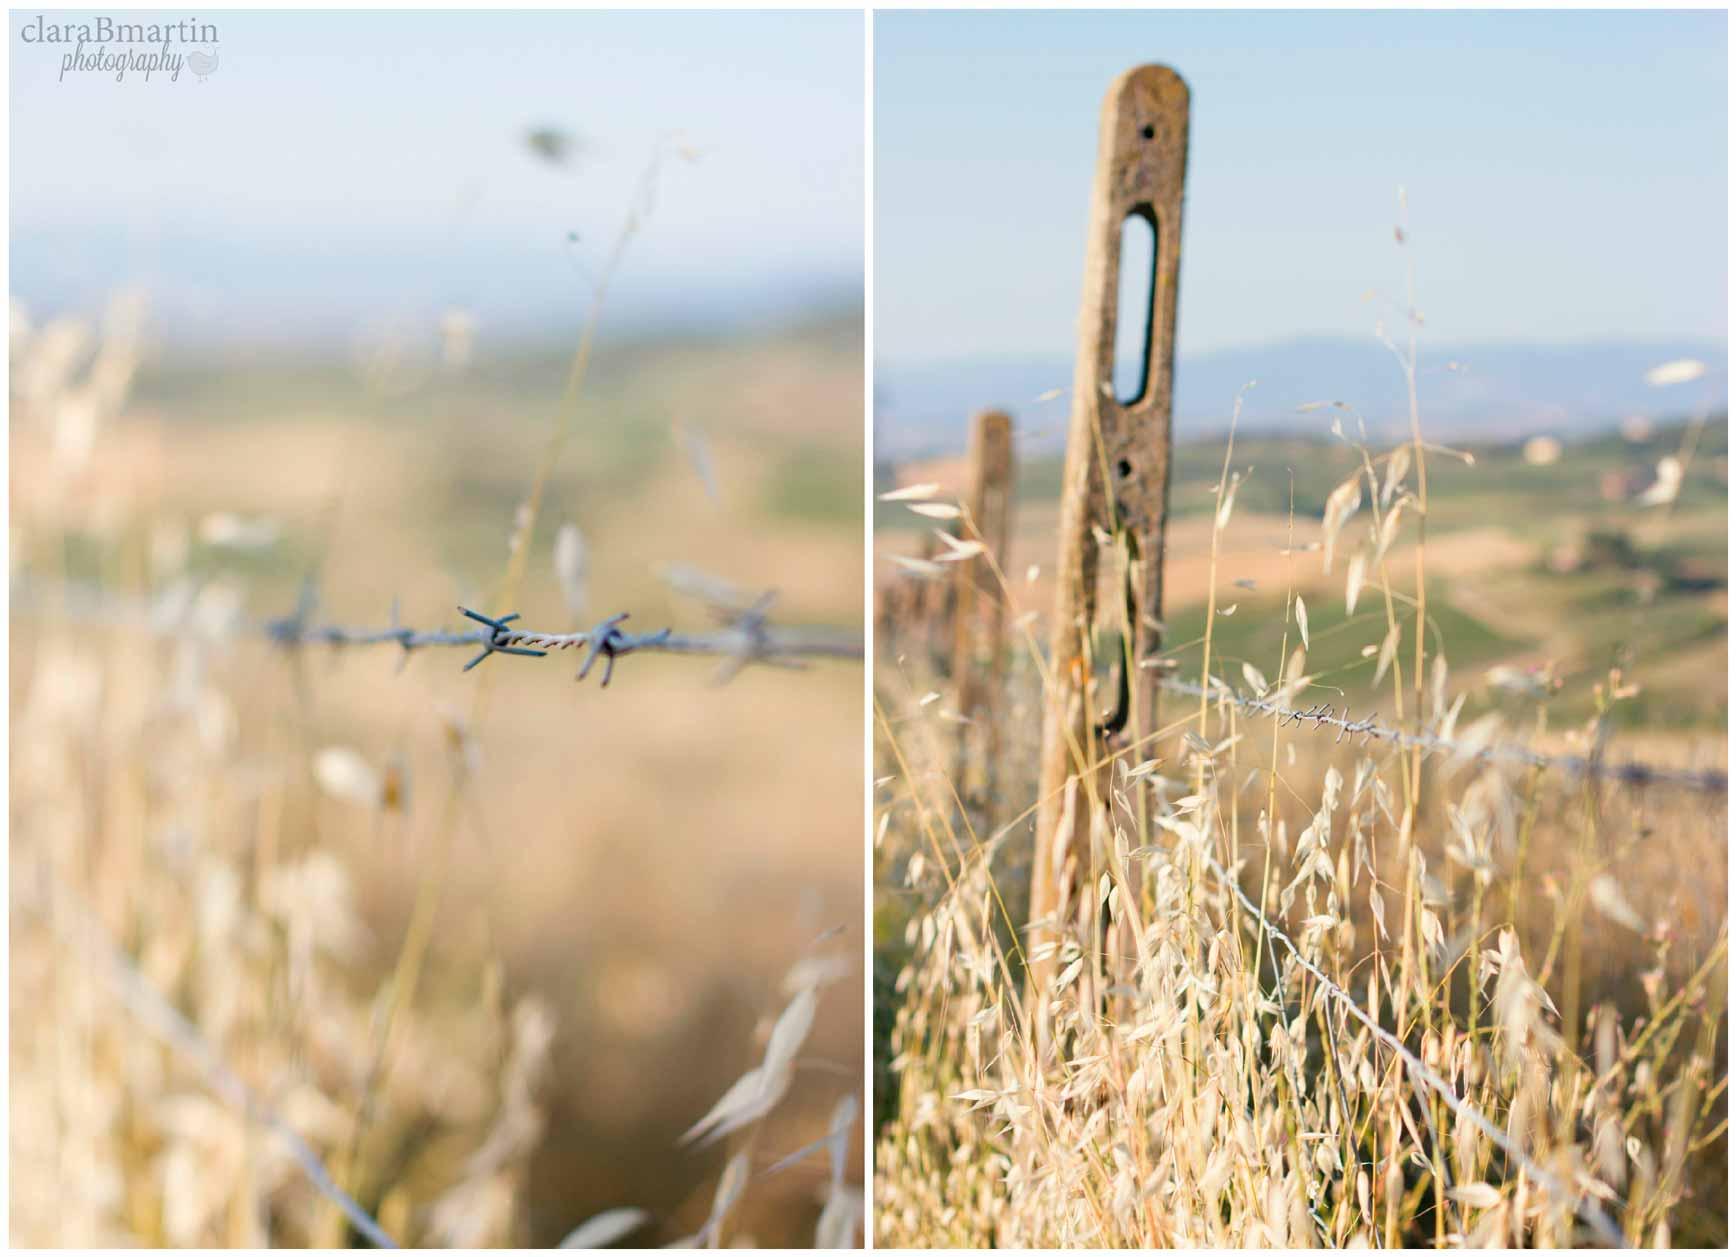 Tuscany_claraBmartin_Collage